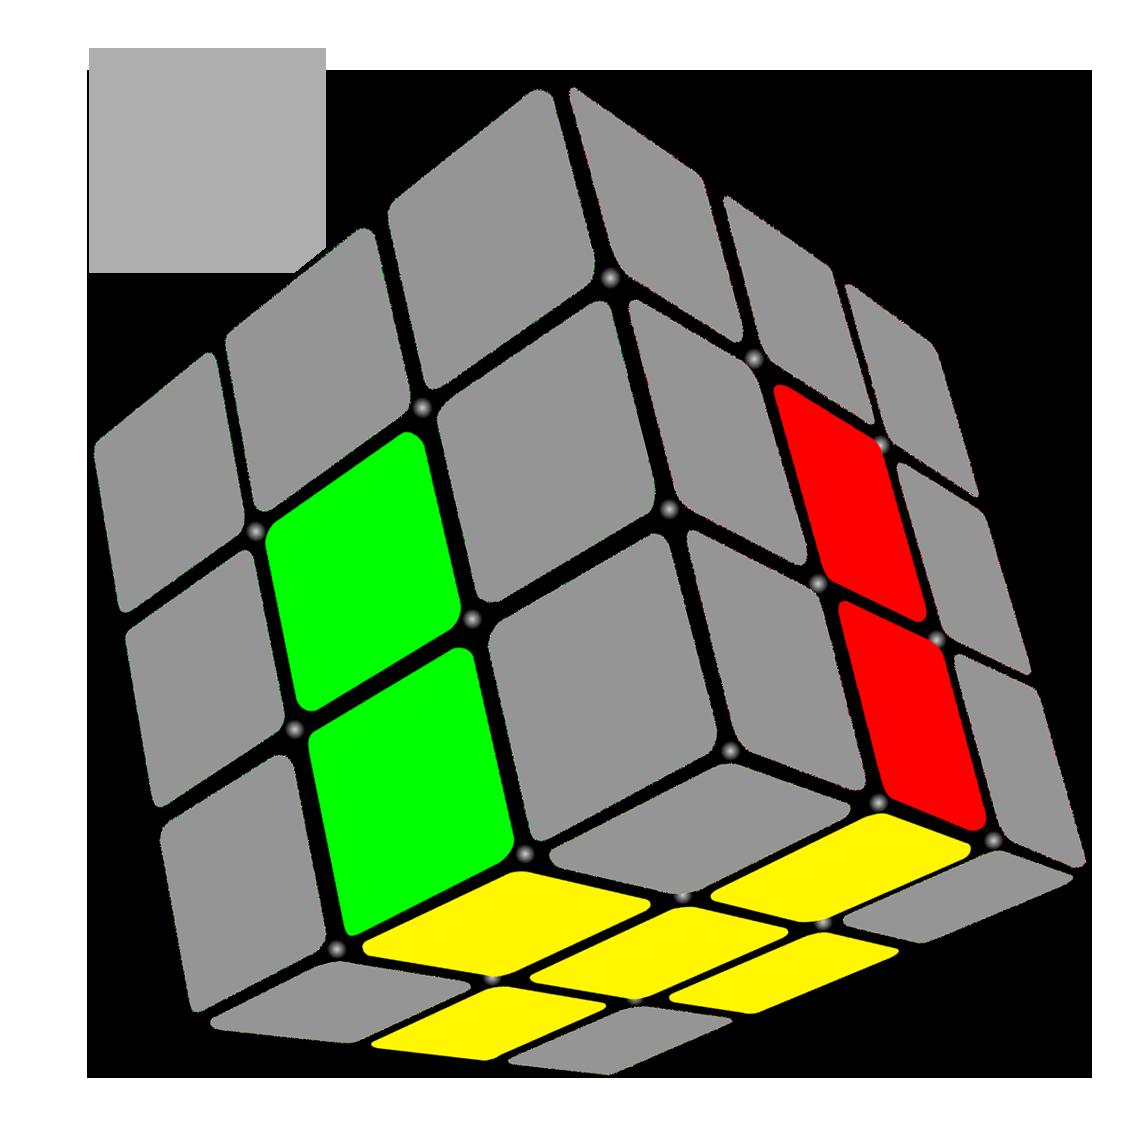 кубик-рубик грани картинки очень важно, ведь